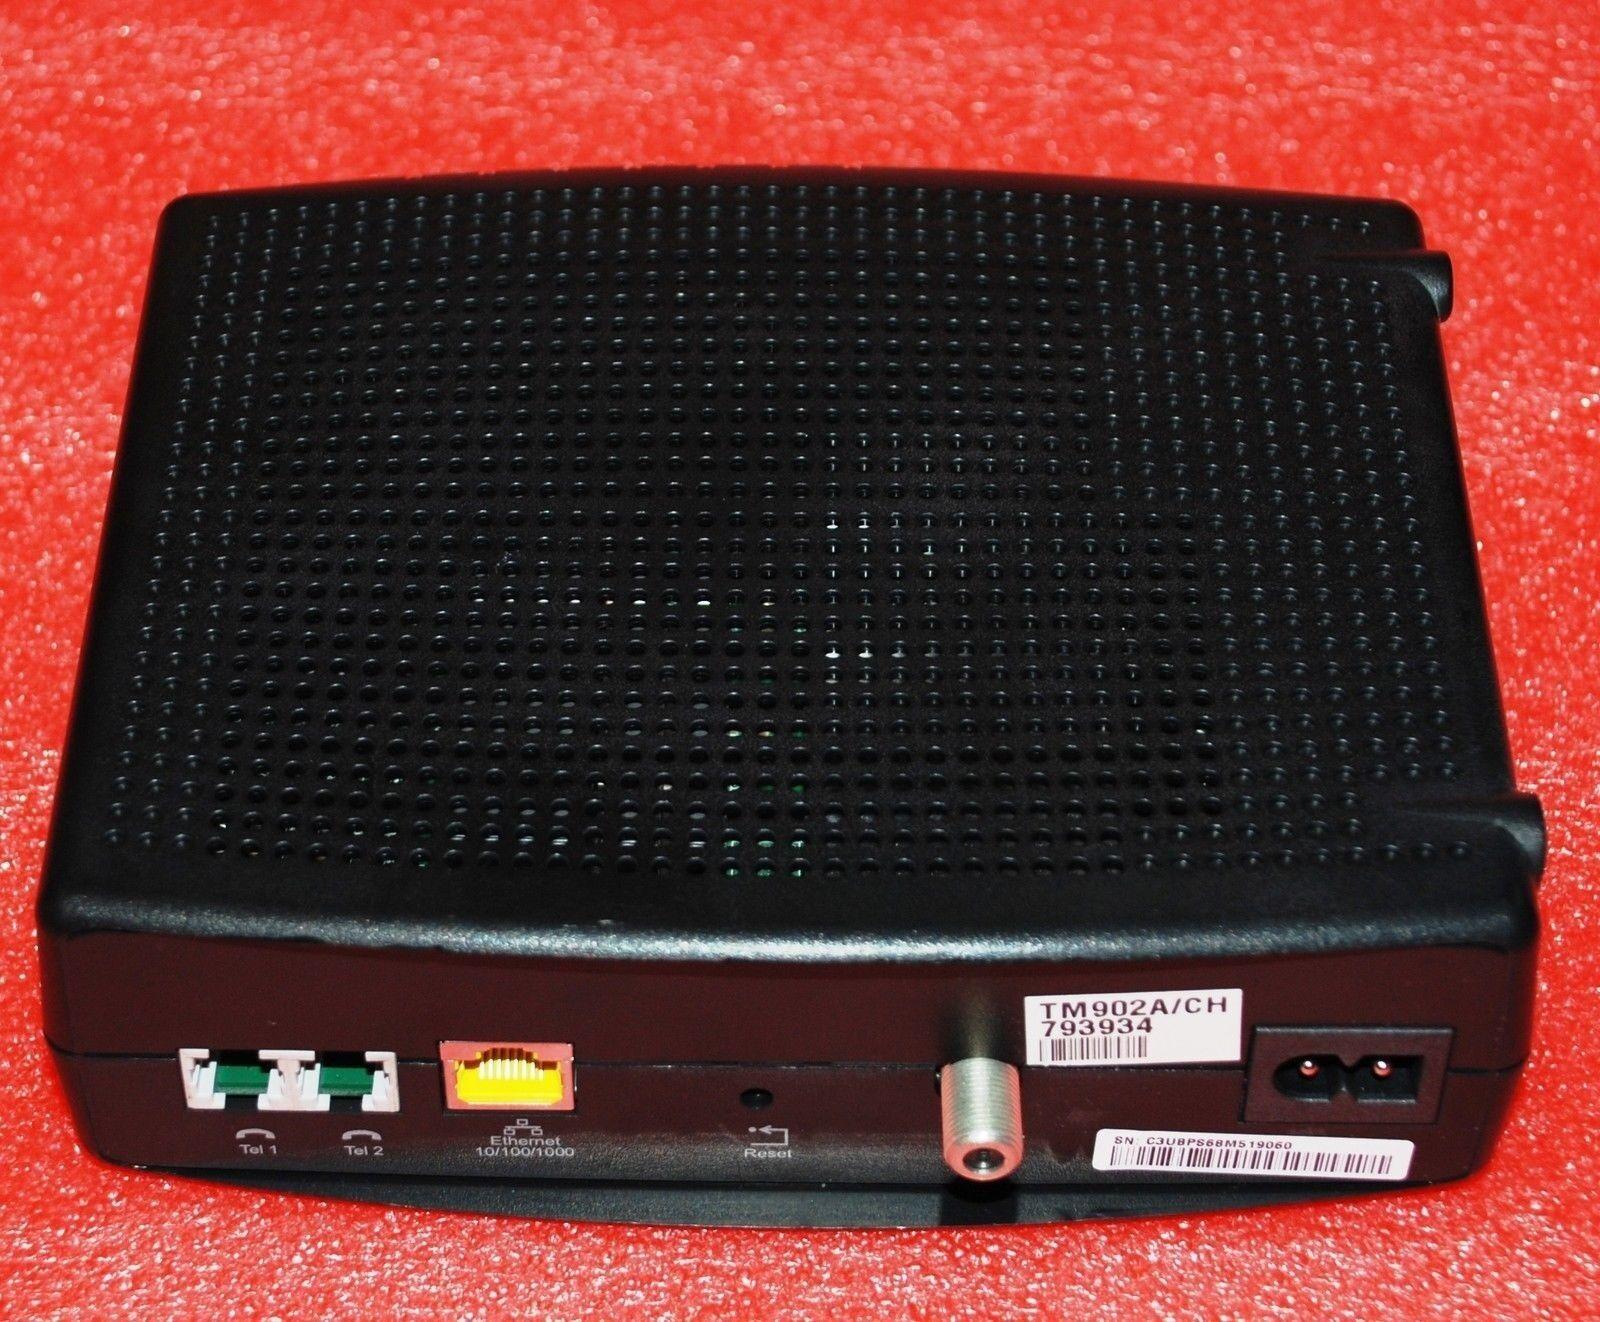 ARRIS Tm902a Touchstone 8x4 DOCSIS 3 Telephony Modem 300 Mbps for